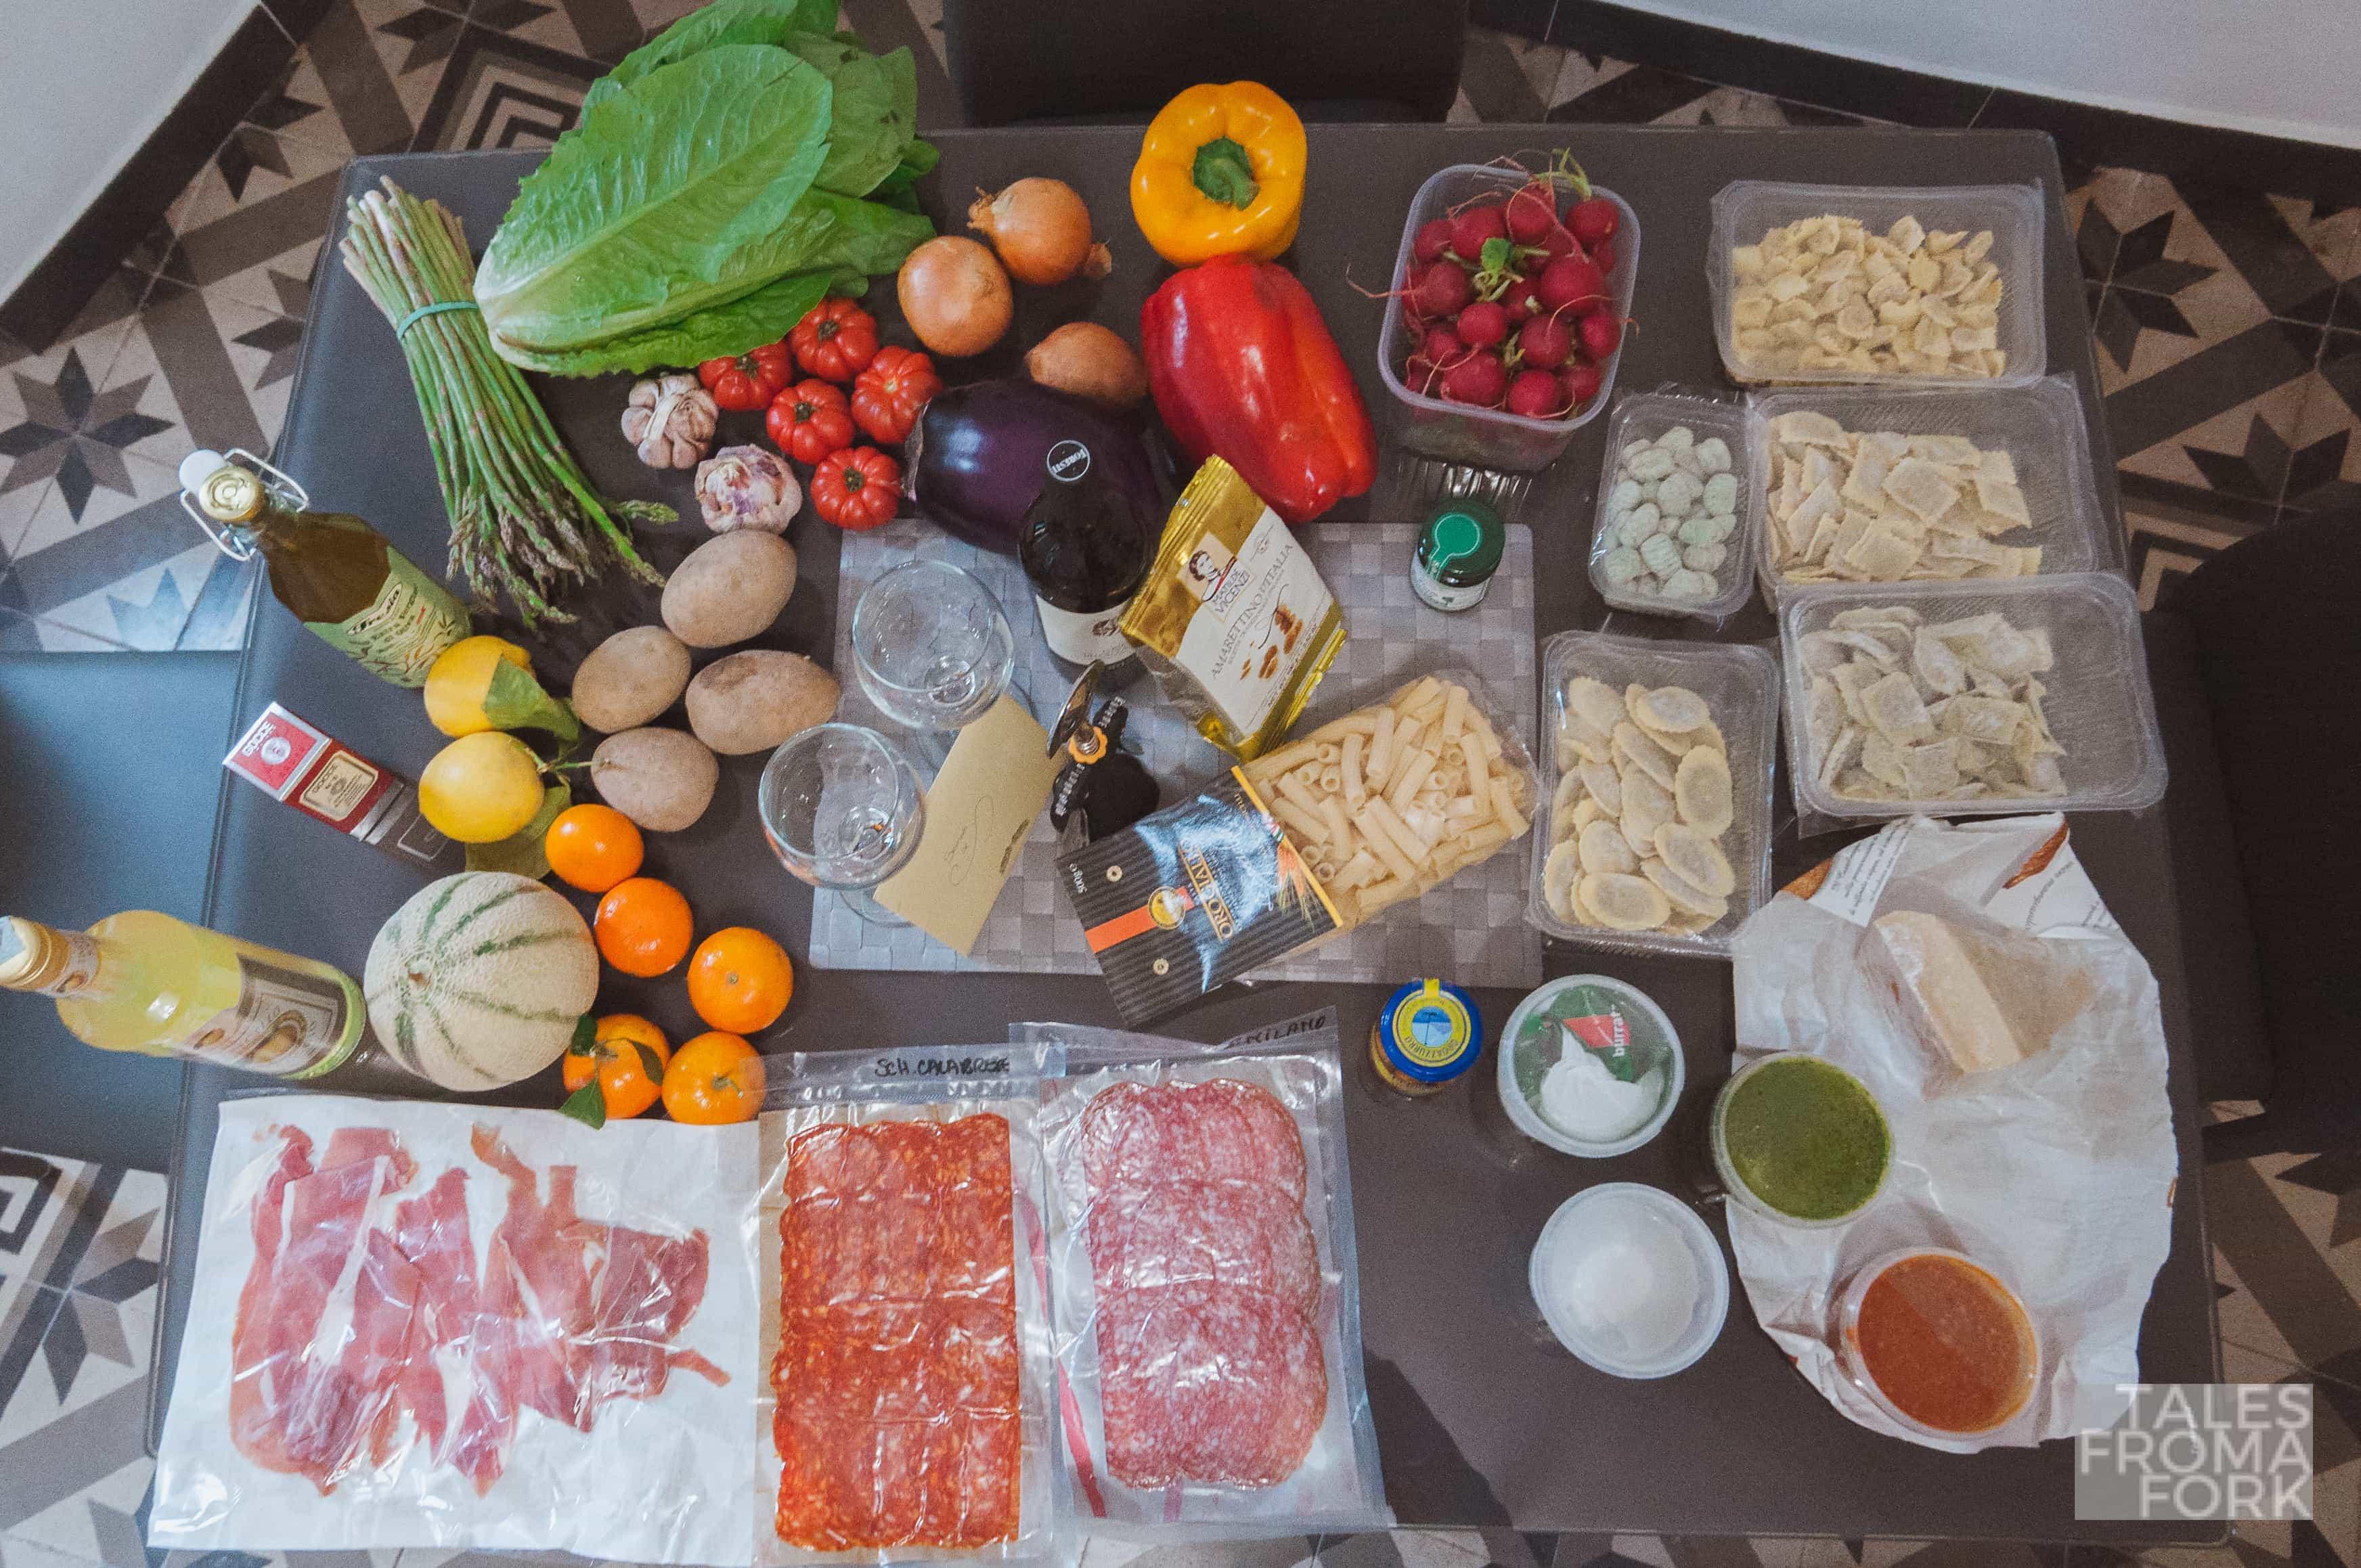 ventimiglia market italy pigna italy where to shop